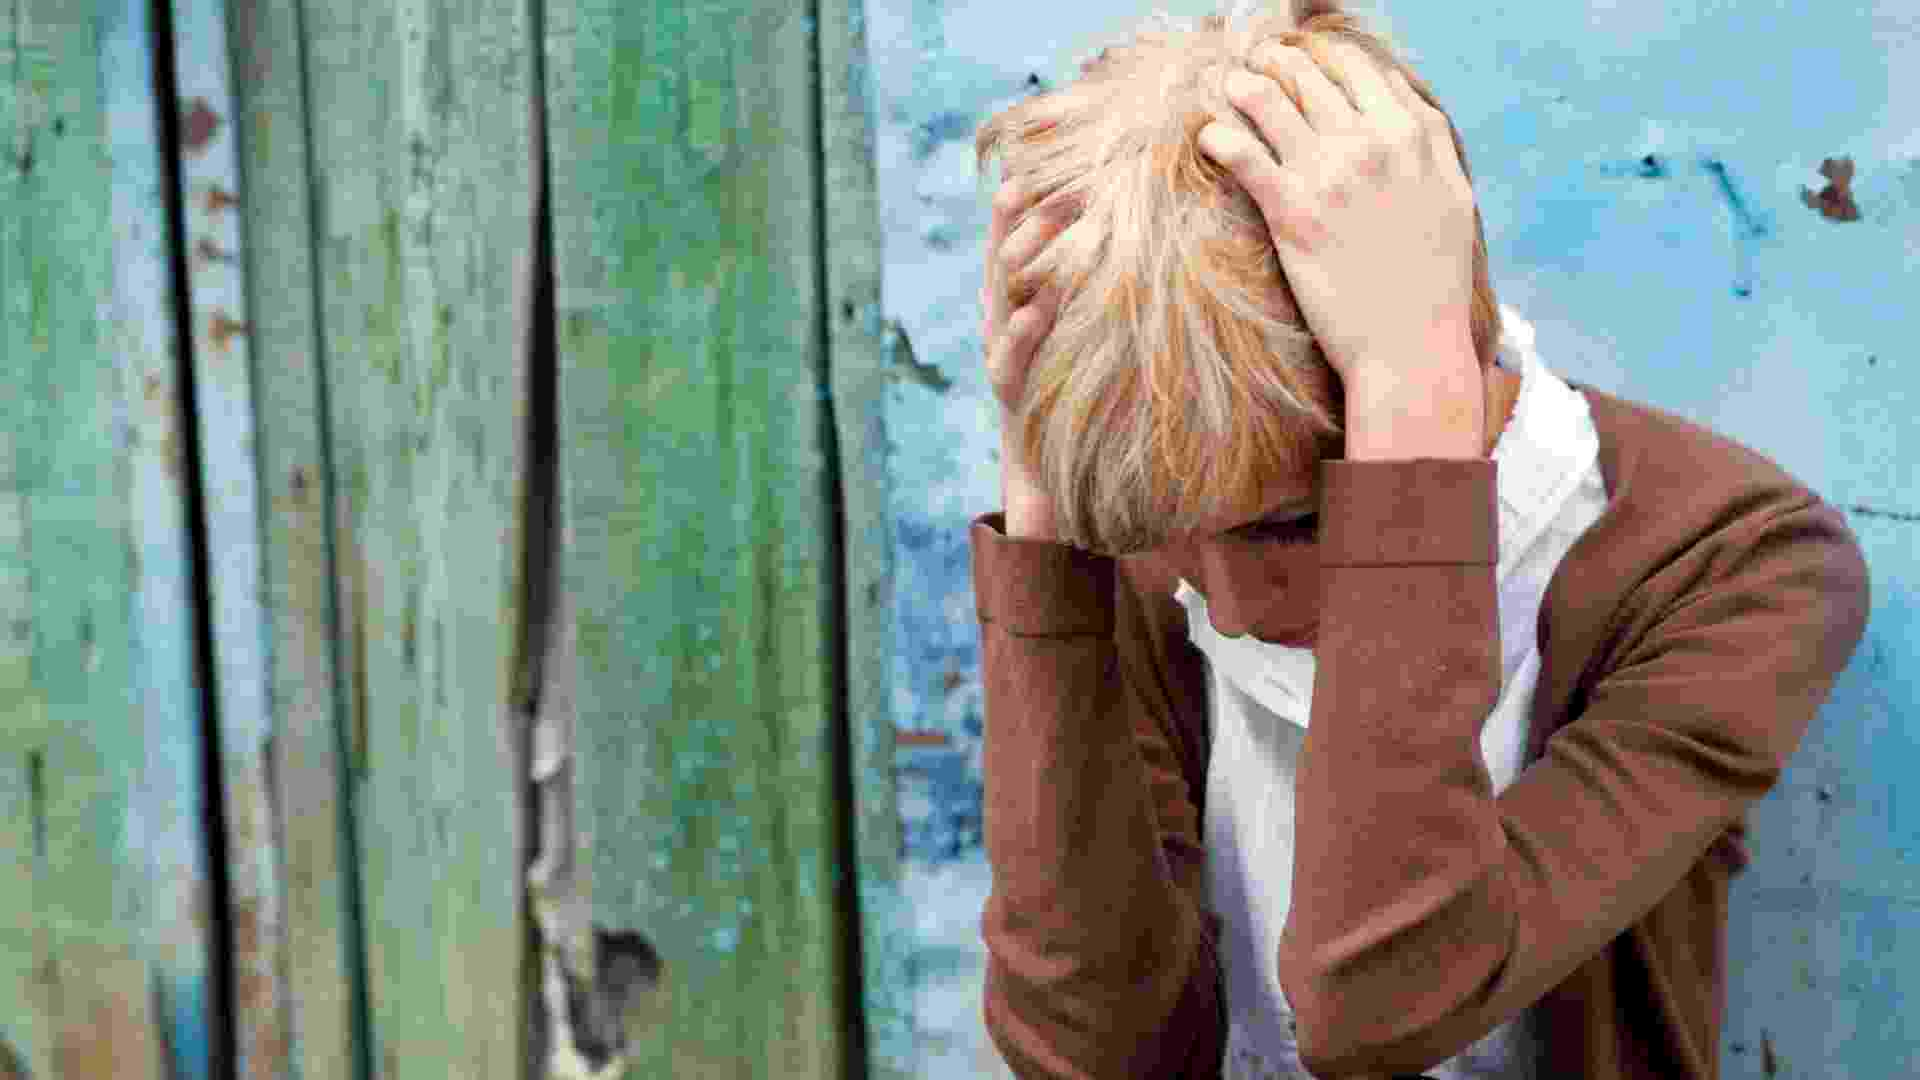 Imagem ilustrativa para arrependimento, remorso, raiva, tristeza - Thinkstock